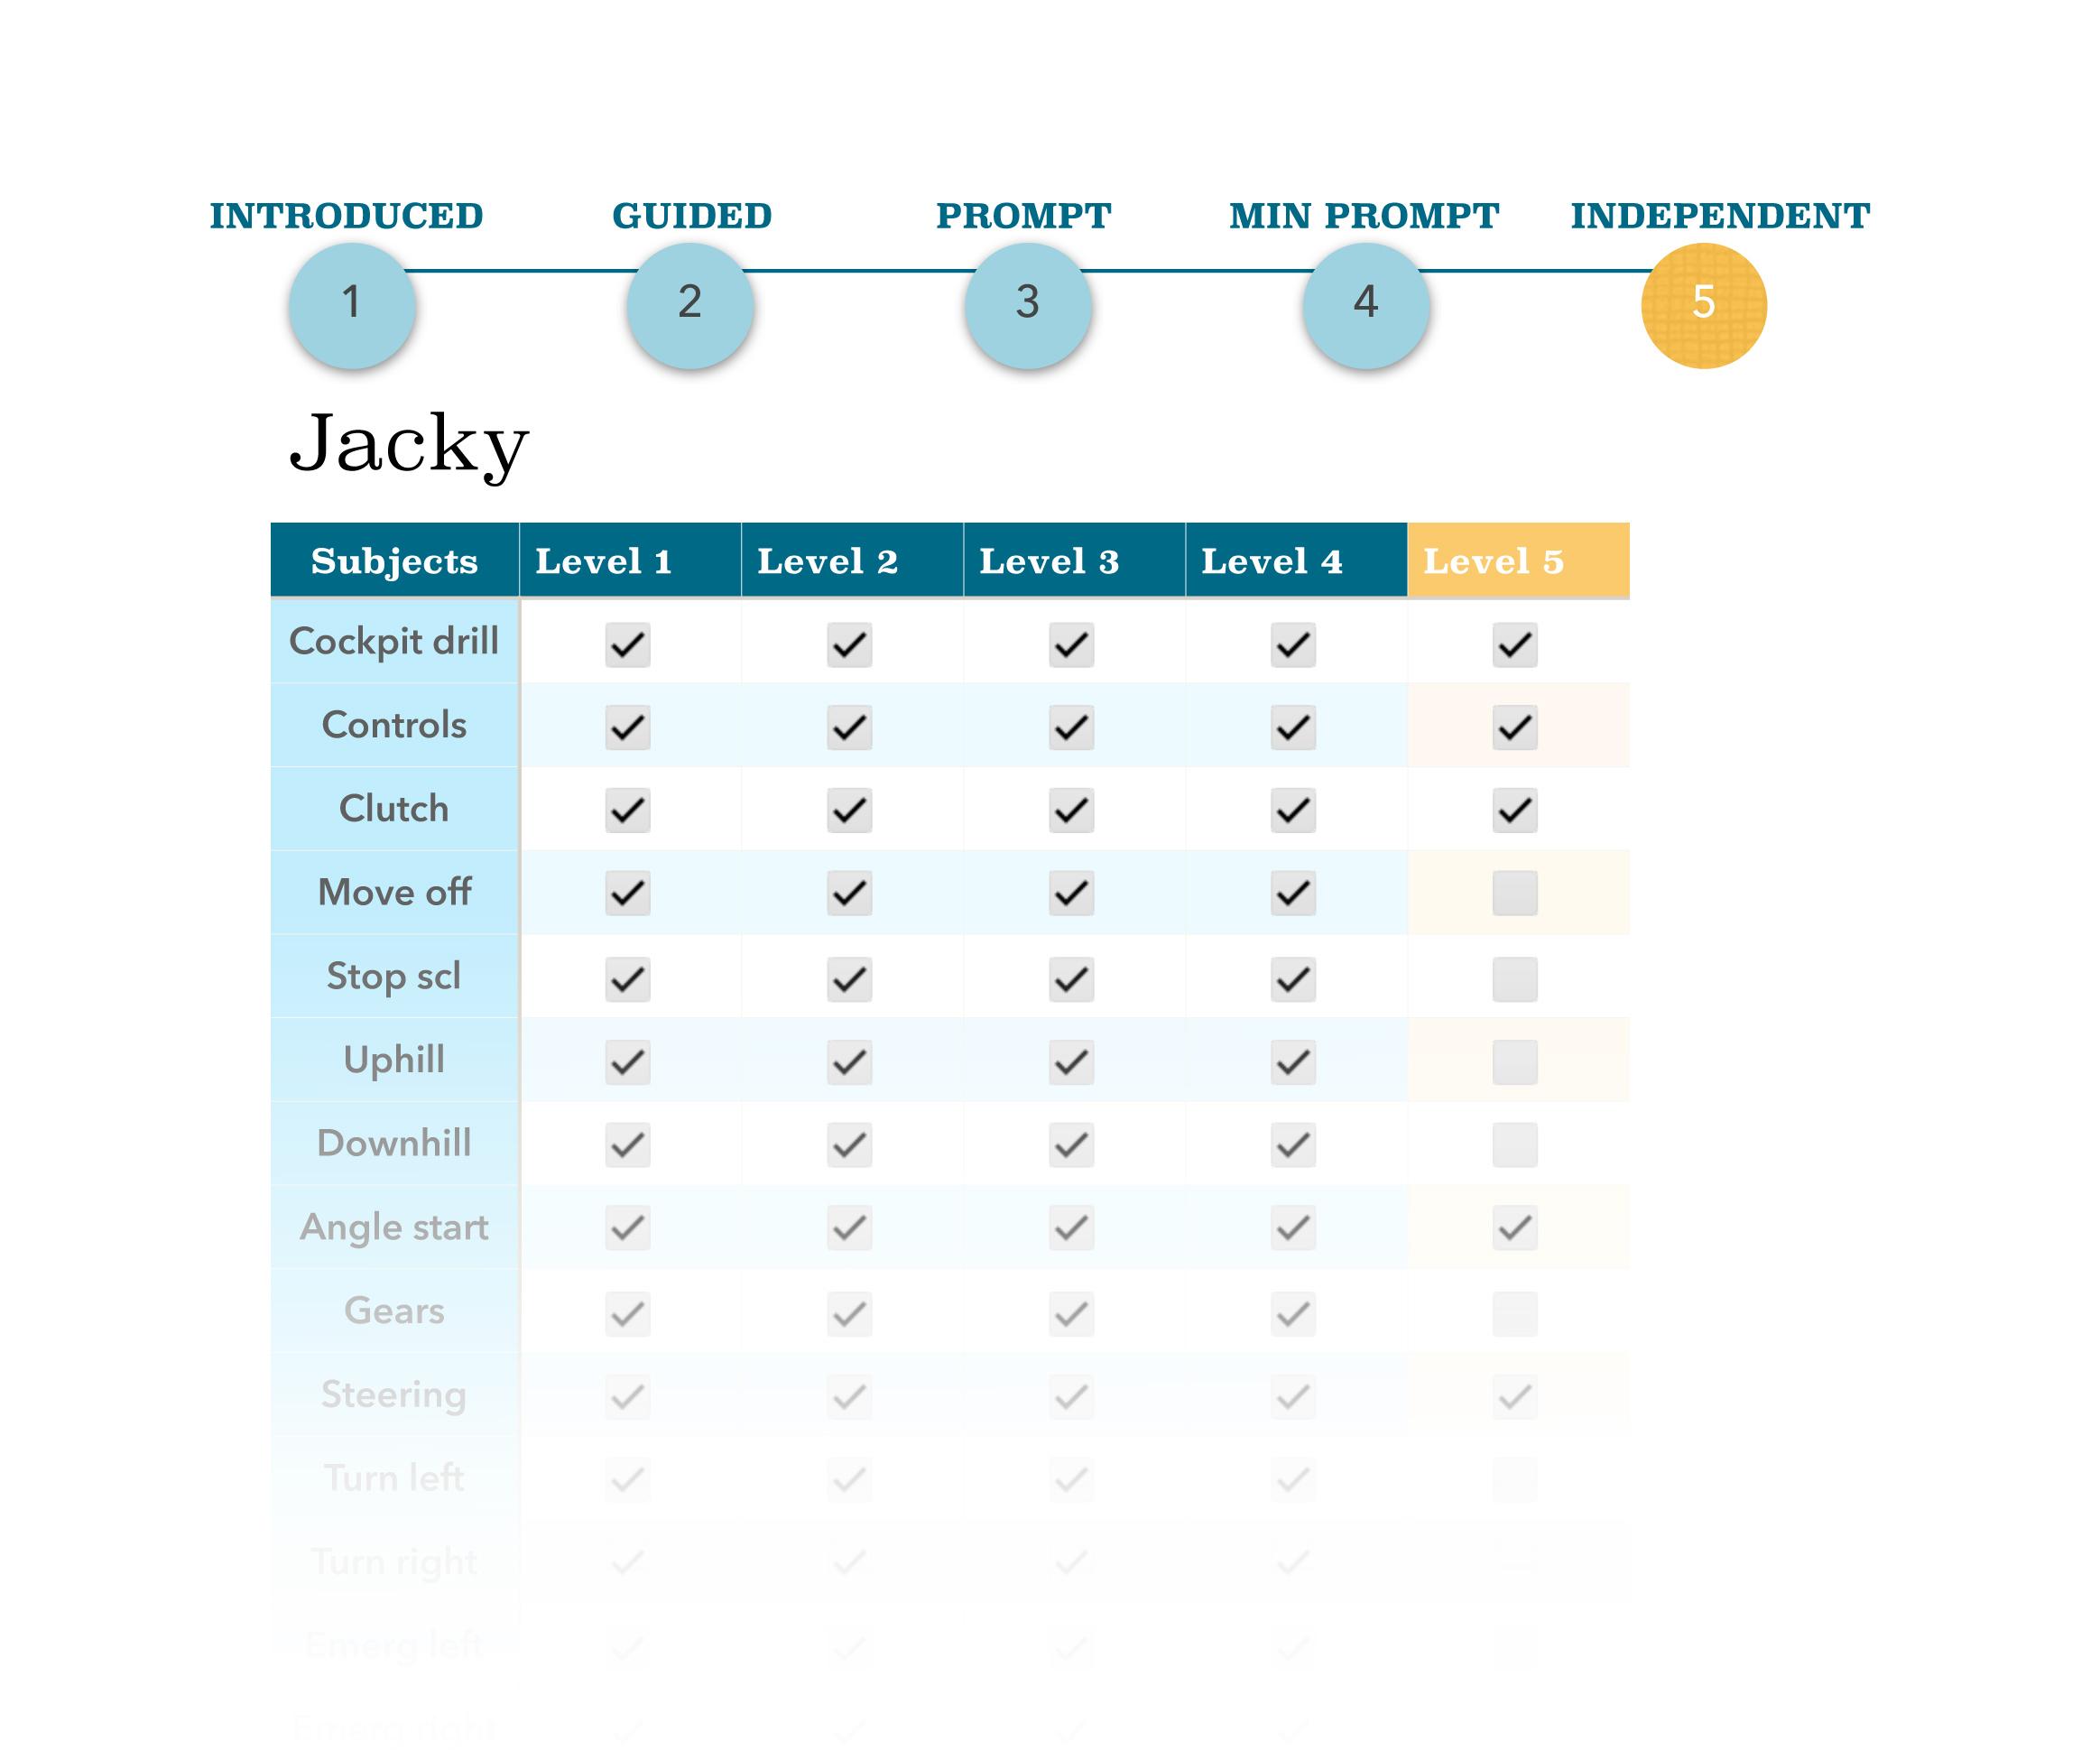 Jacky progress